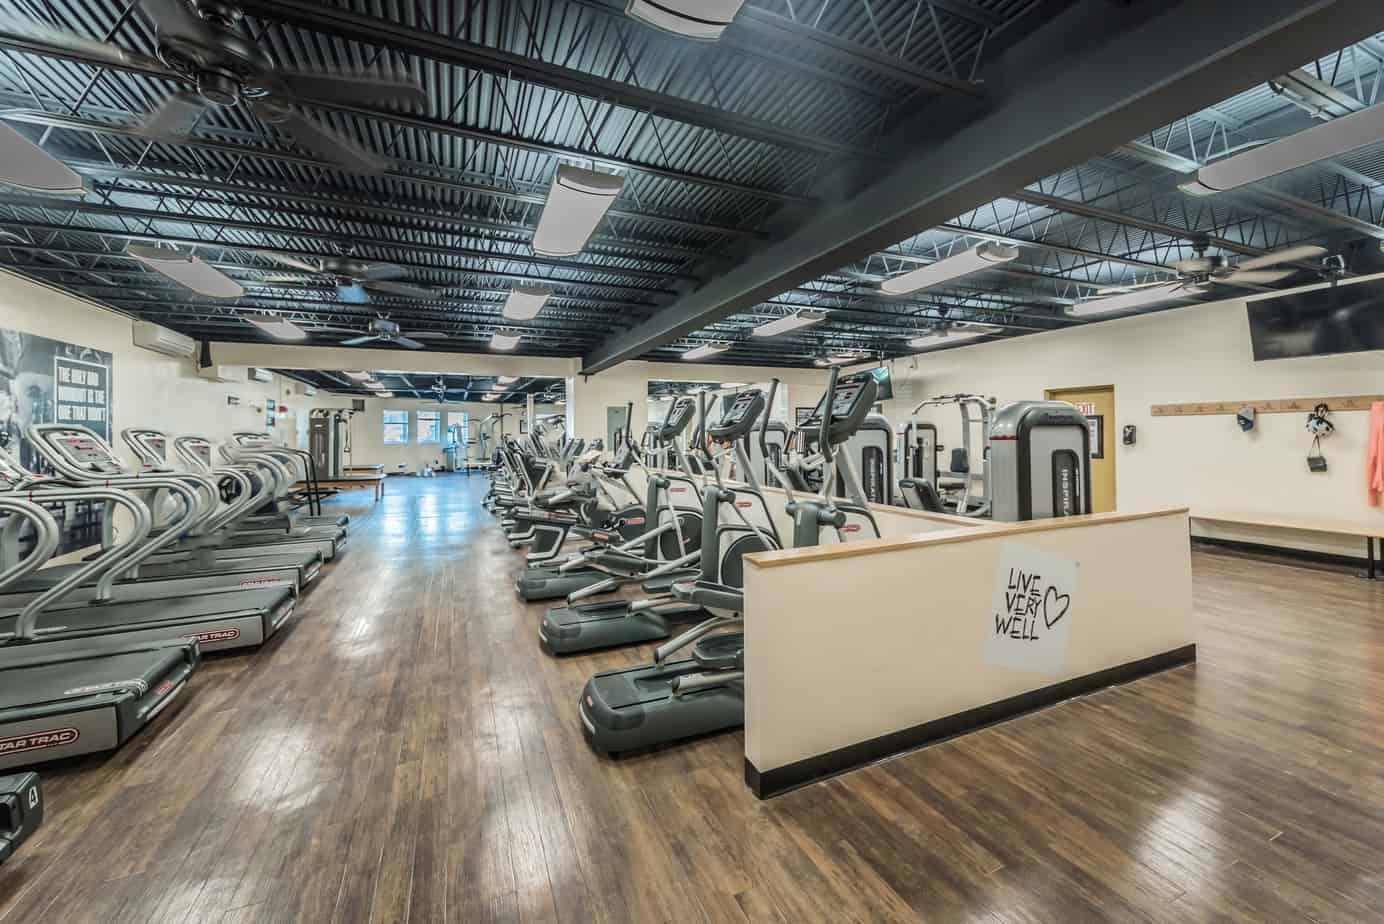 22-2285-Israeli-Dr-#17-Clearwater-Fl-33763-Fitness Center